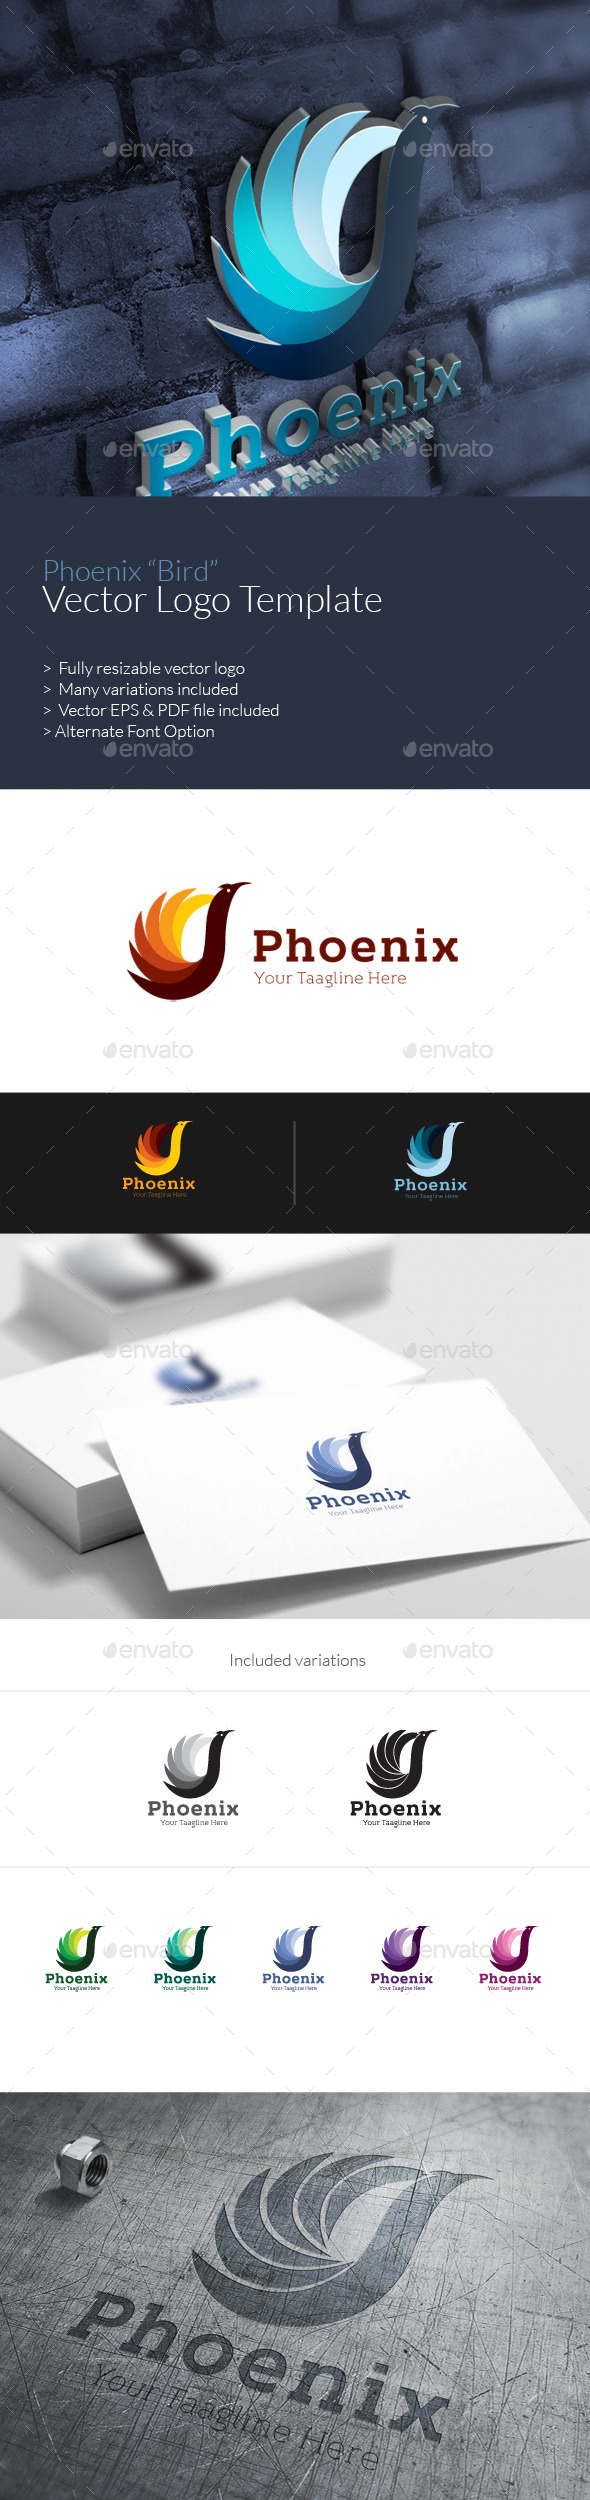 GraphicRiver Phoenix Logo Template 9764002